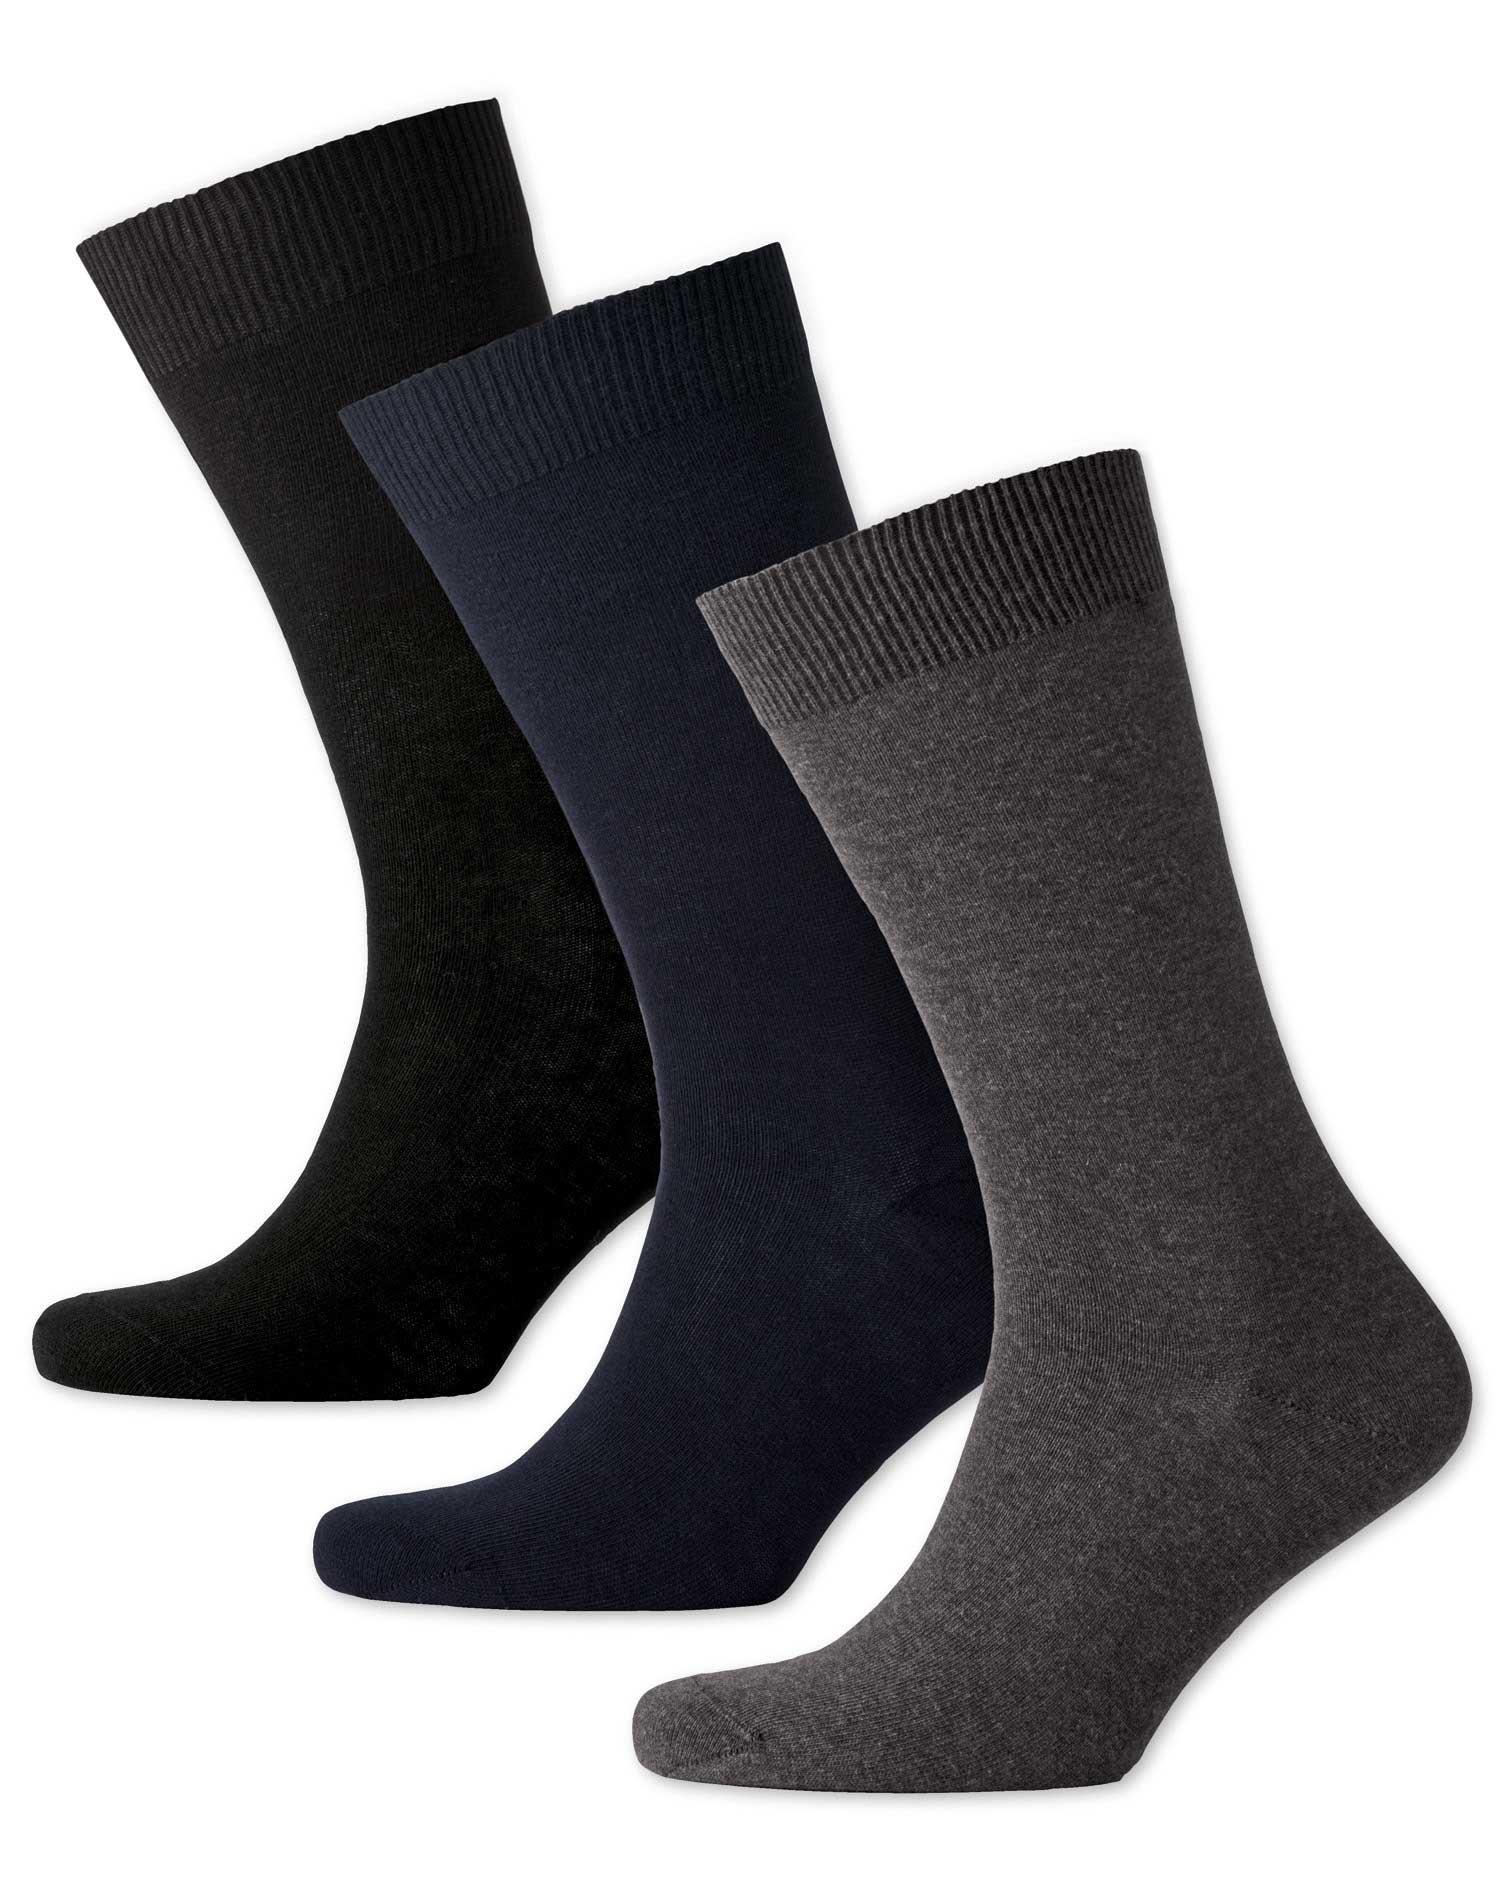 Multi Cotton Rich 3 Pack Socks Size Medium by Charles Tyrwhitt